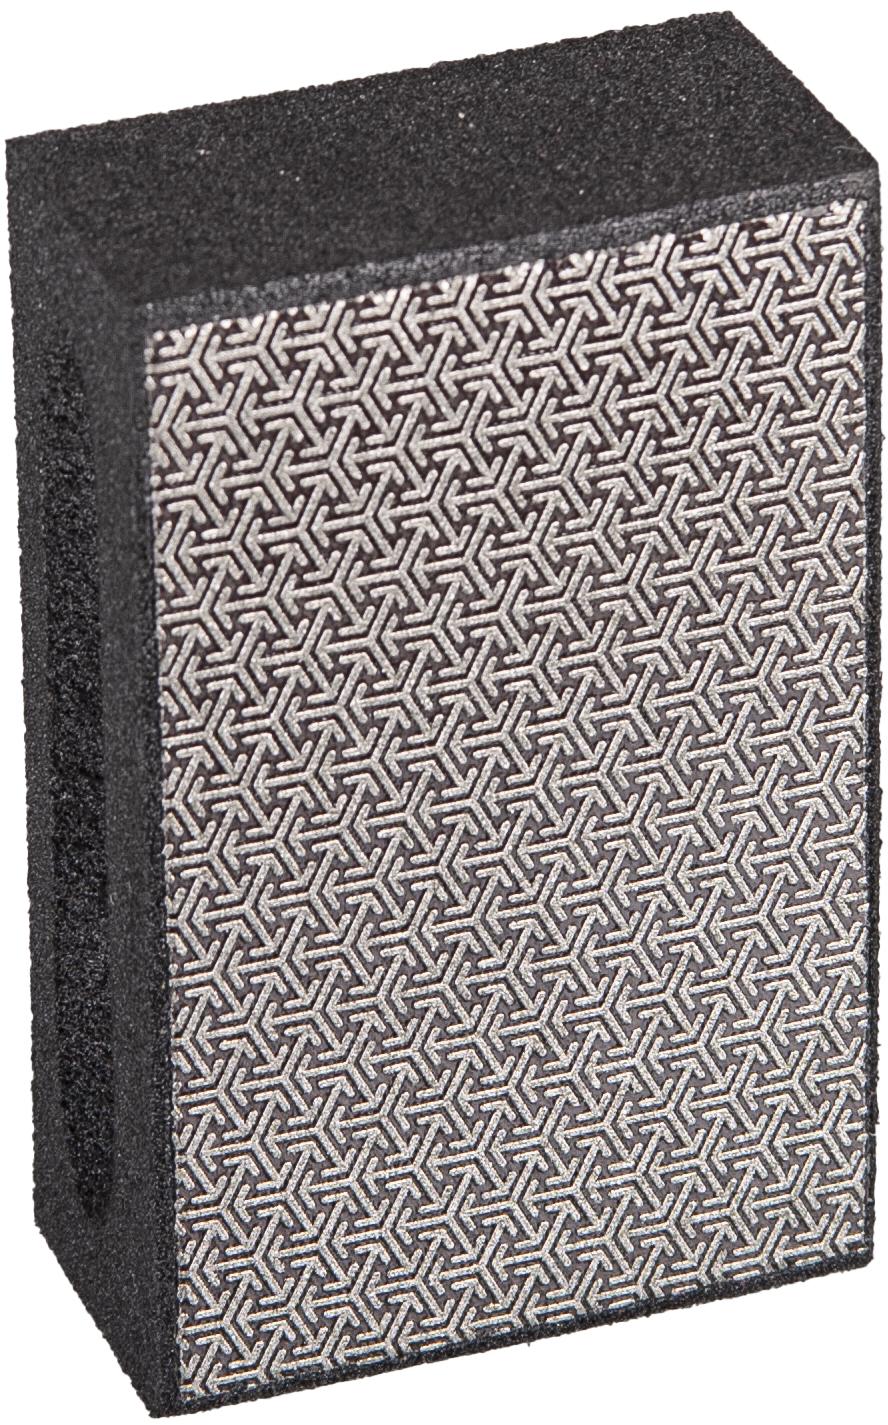 Telum Handpad 90 x 55 mm | Korn 120